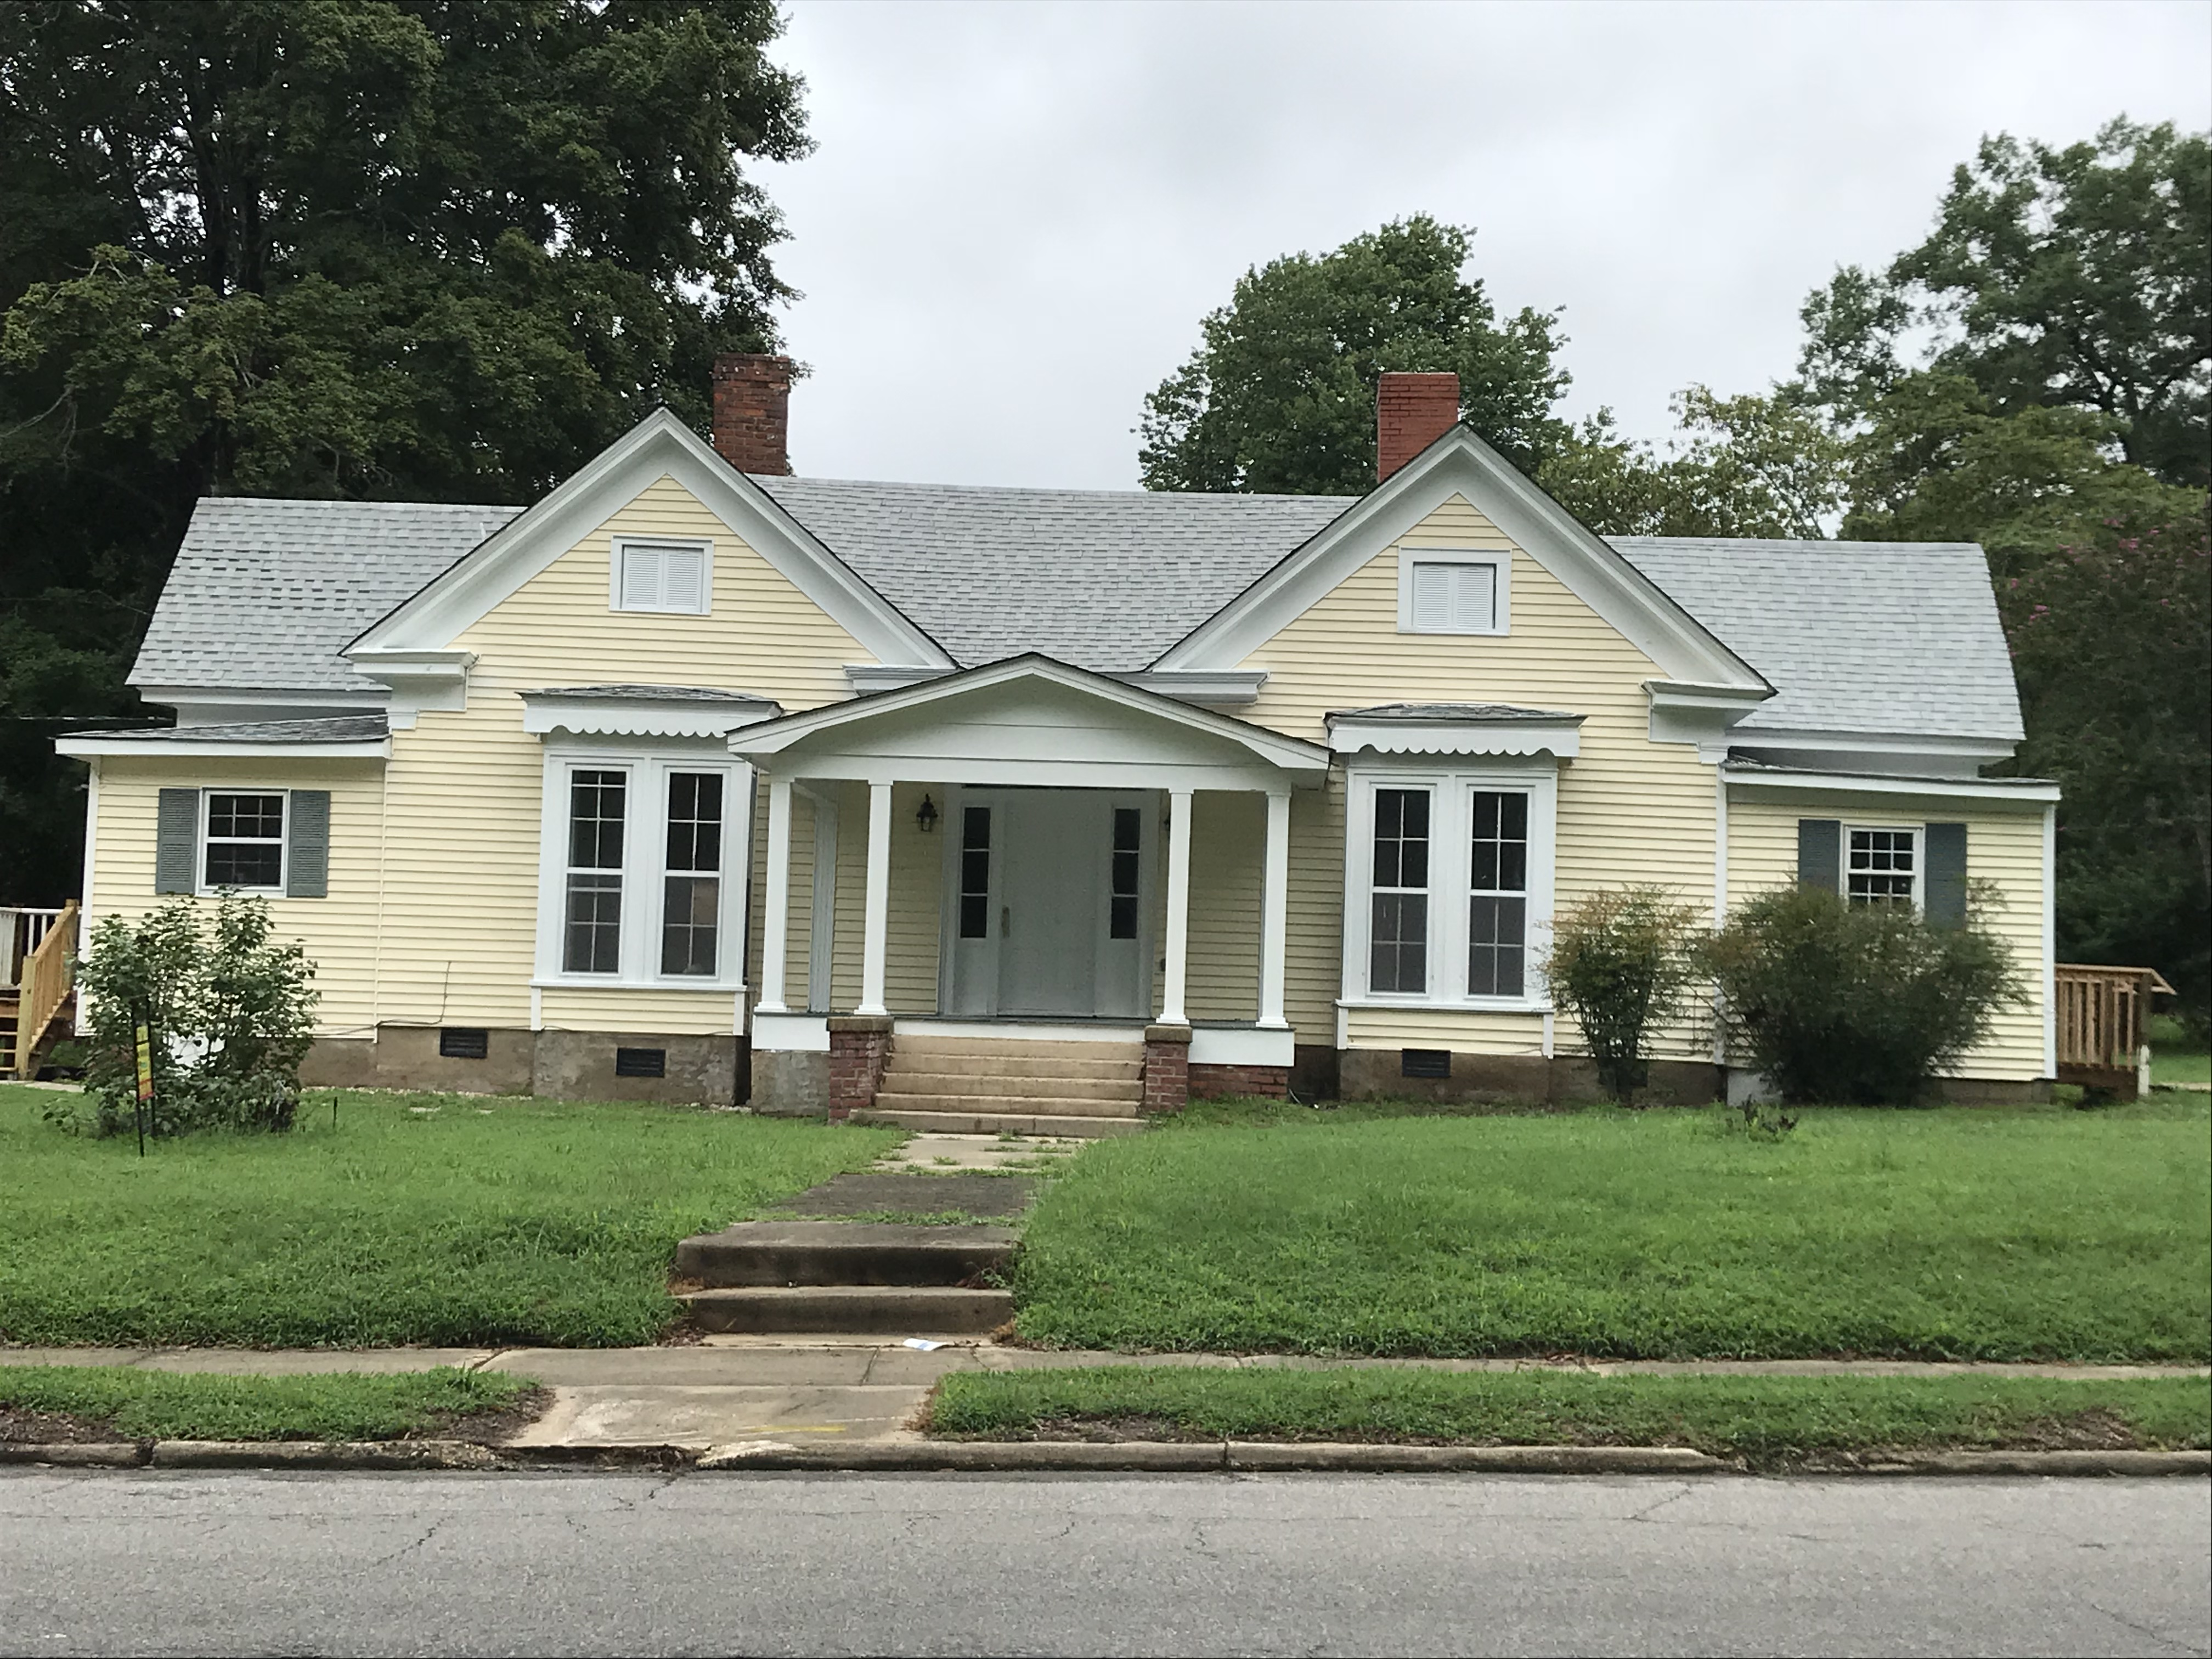 411 E Mason St, Franklinton, NC